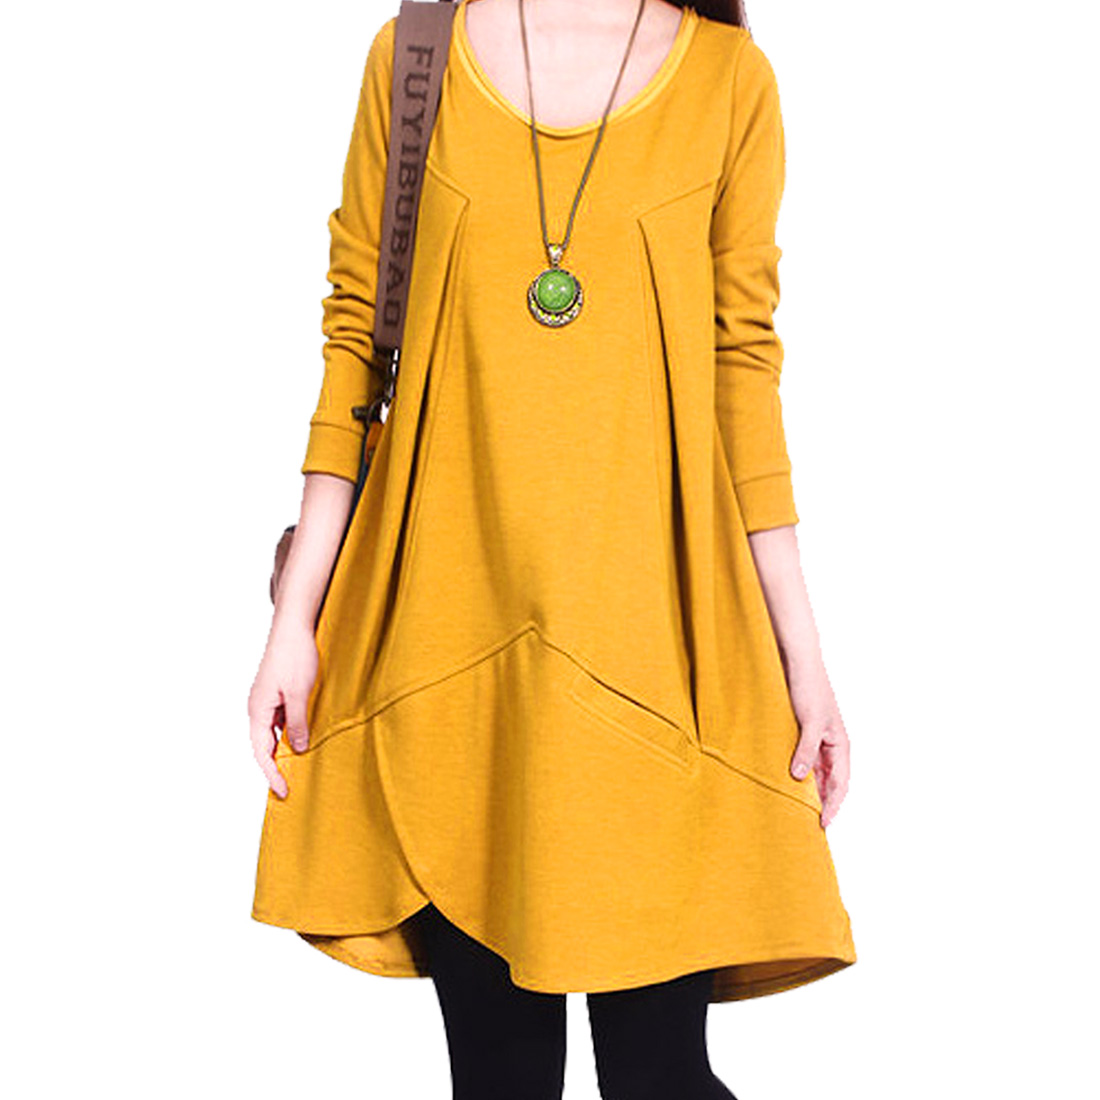 Women Long Sleeve Irregular Hem Knitting Autumn Chic Tunic Top Yellow S